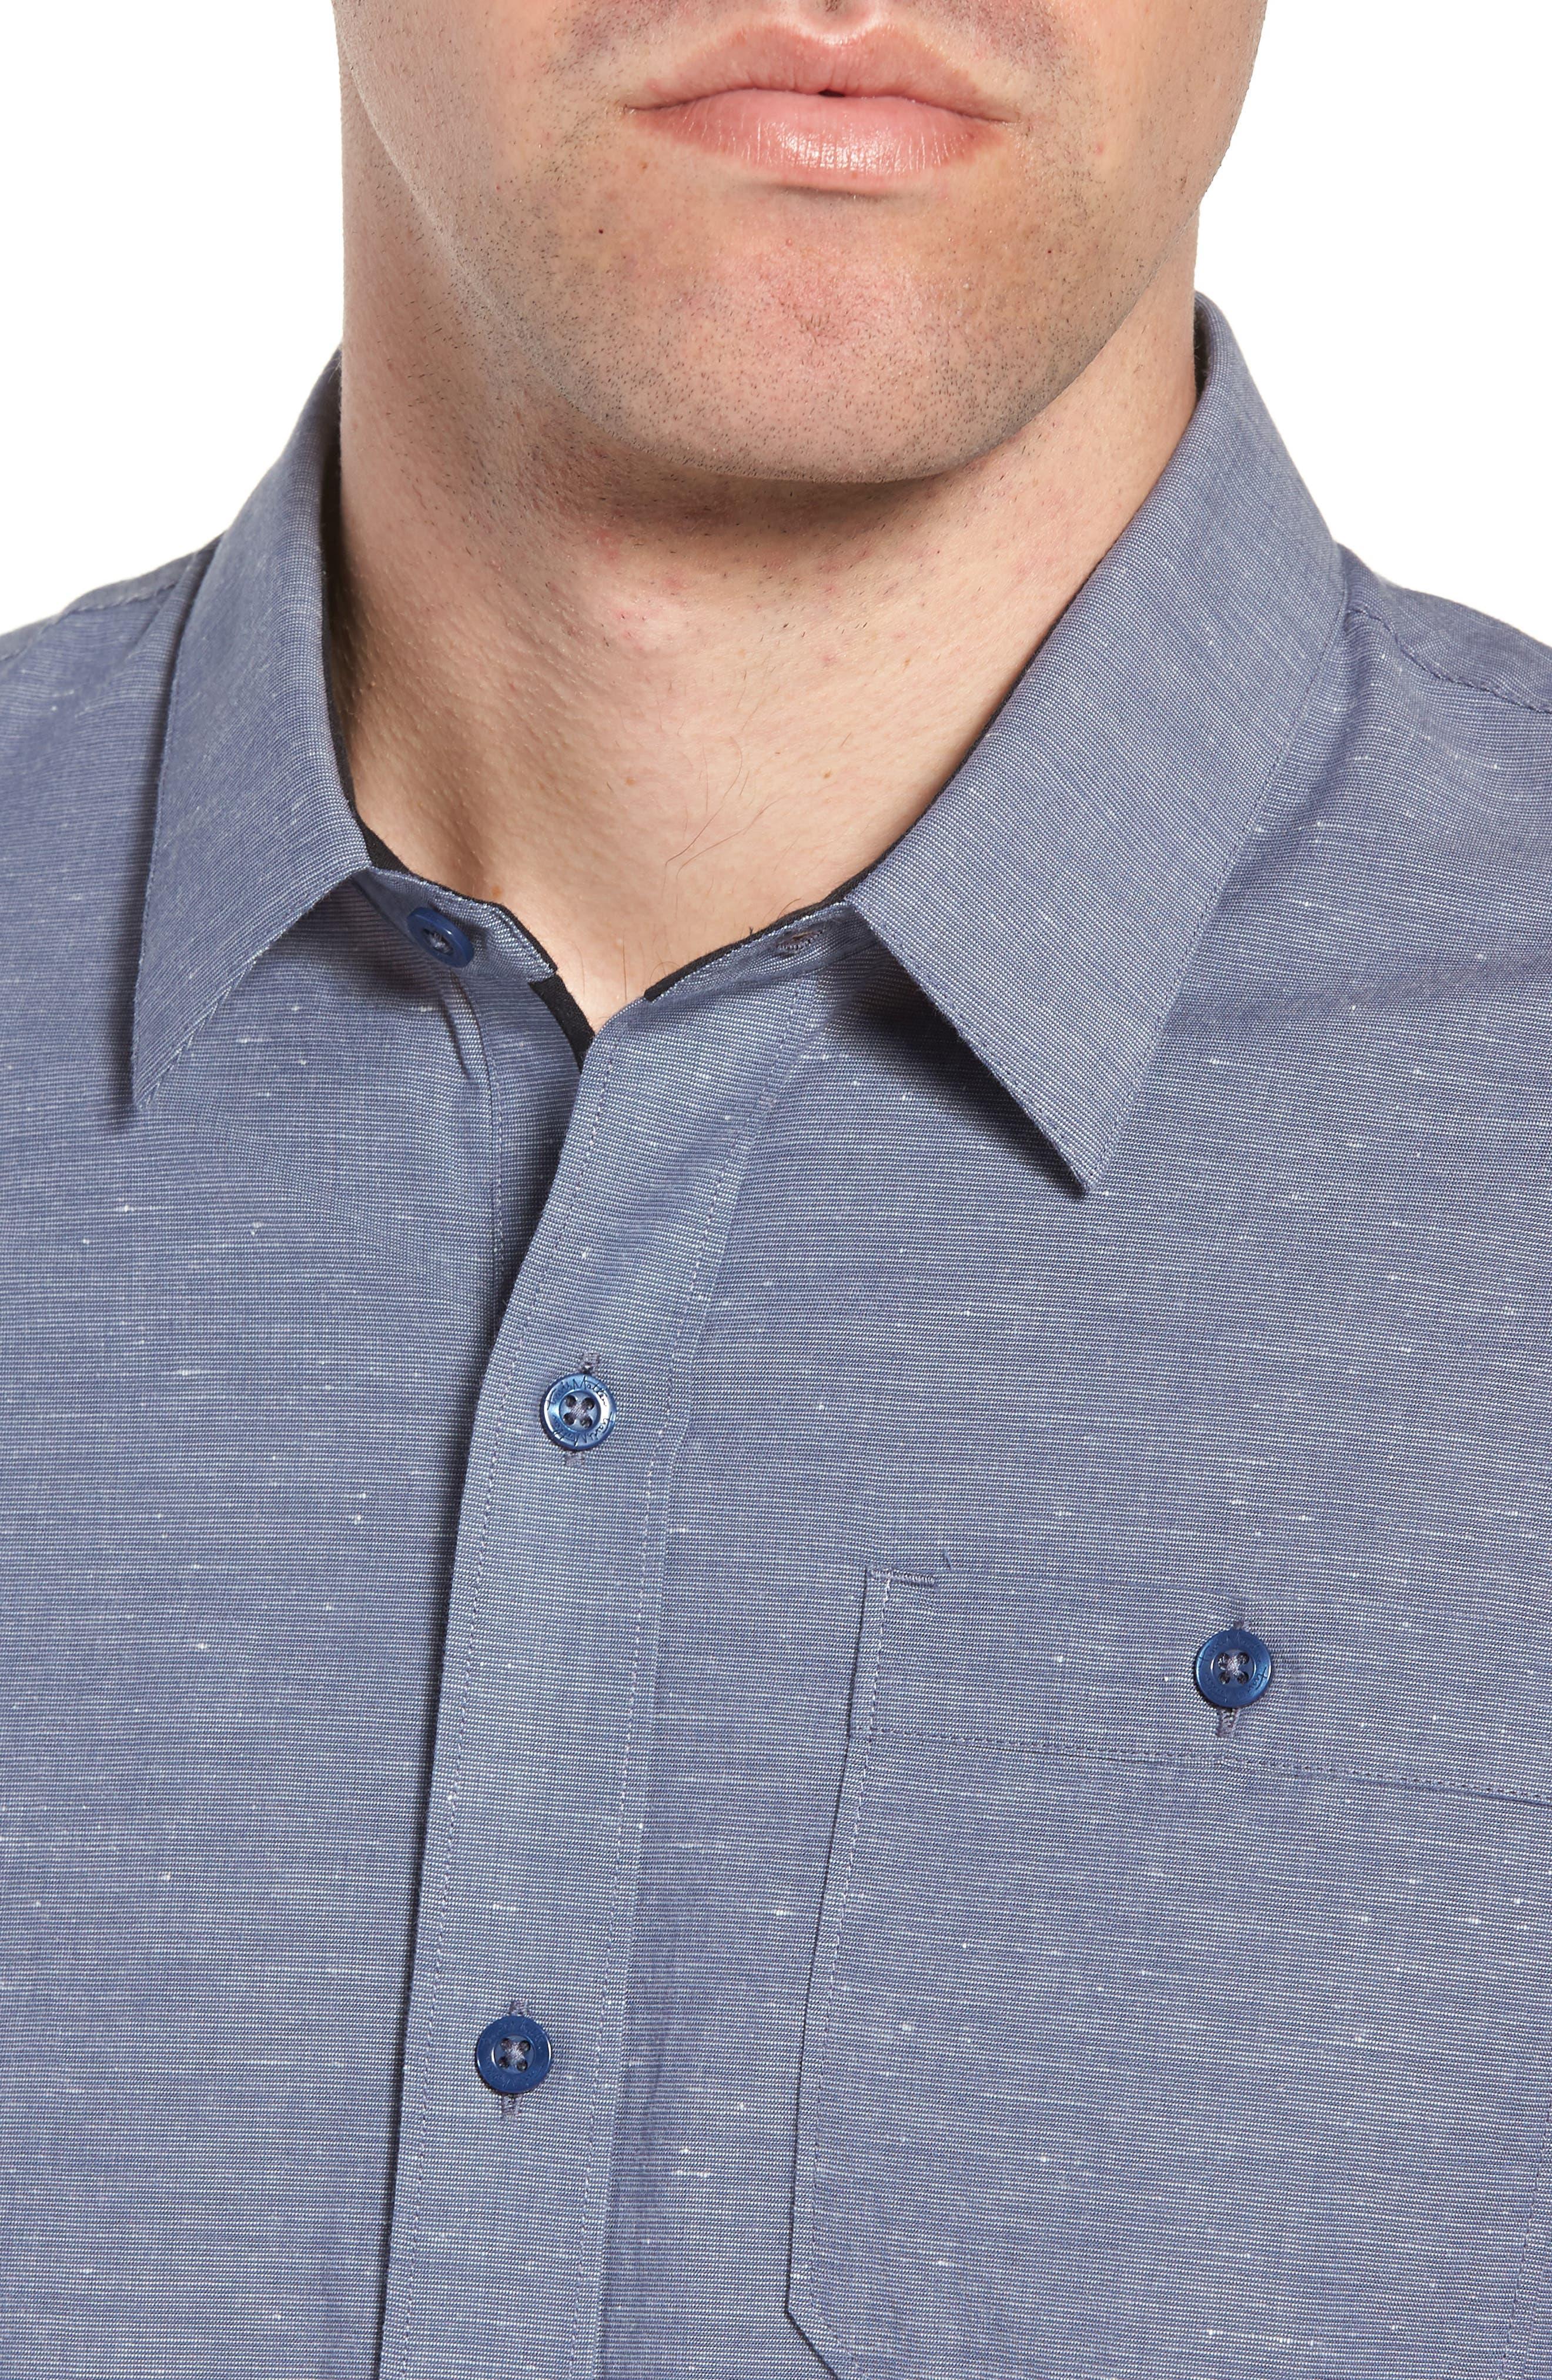 Studebaker Regular Fit Sport Shirt,                             Alternate thumbnail 2, color,                             Vintage Indigo